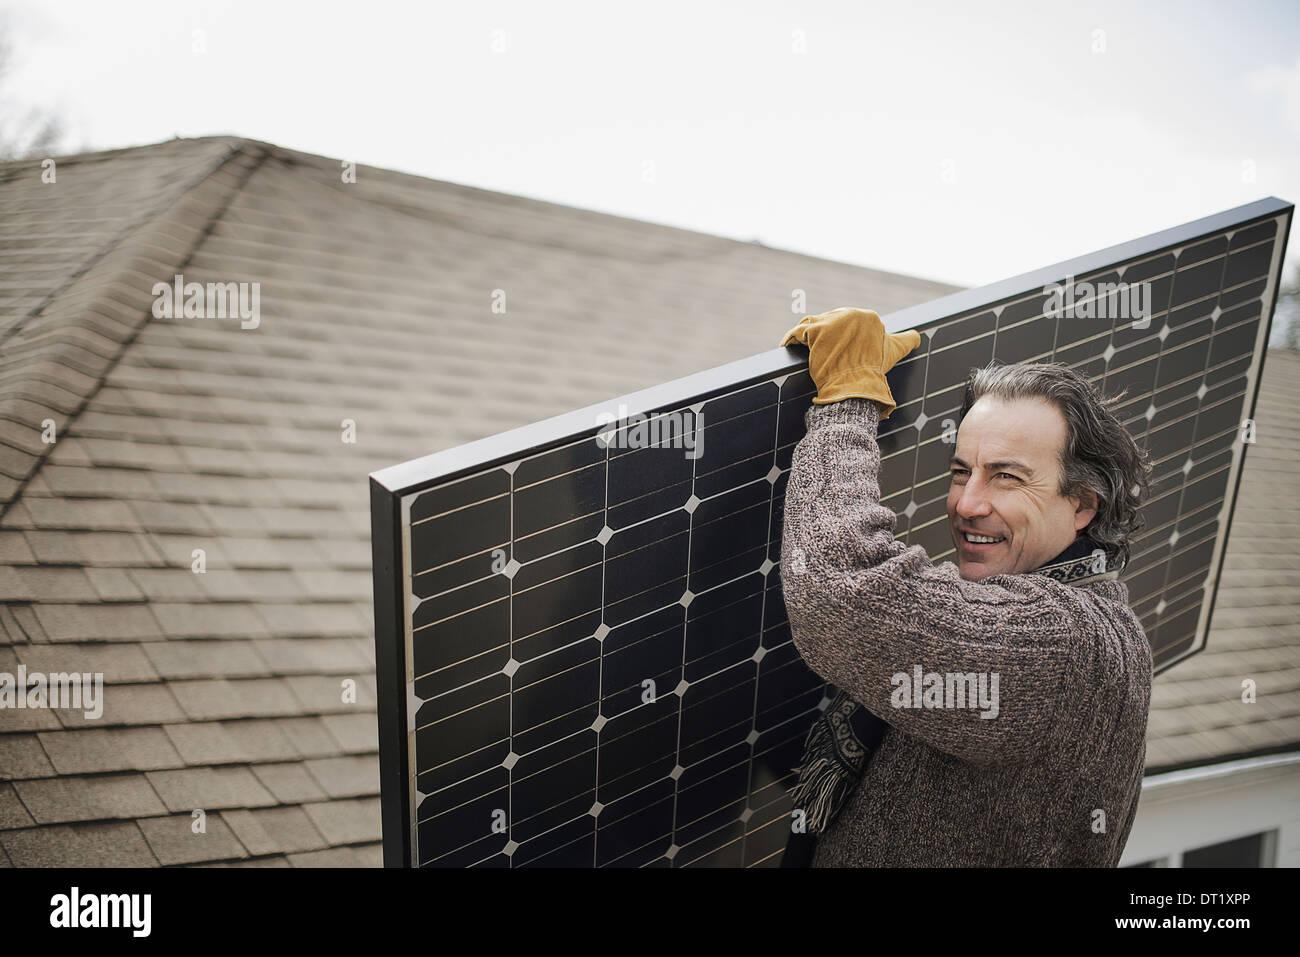 A man carrying a large solar panel across a farmyard - Stock Image